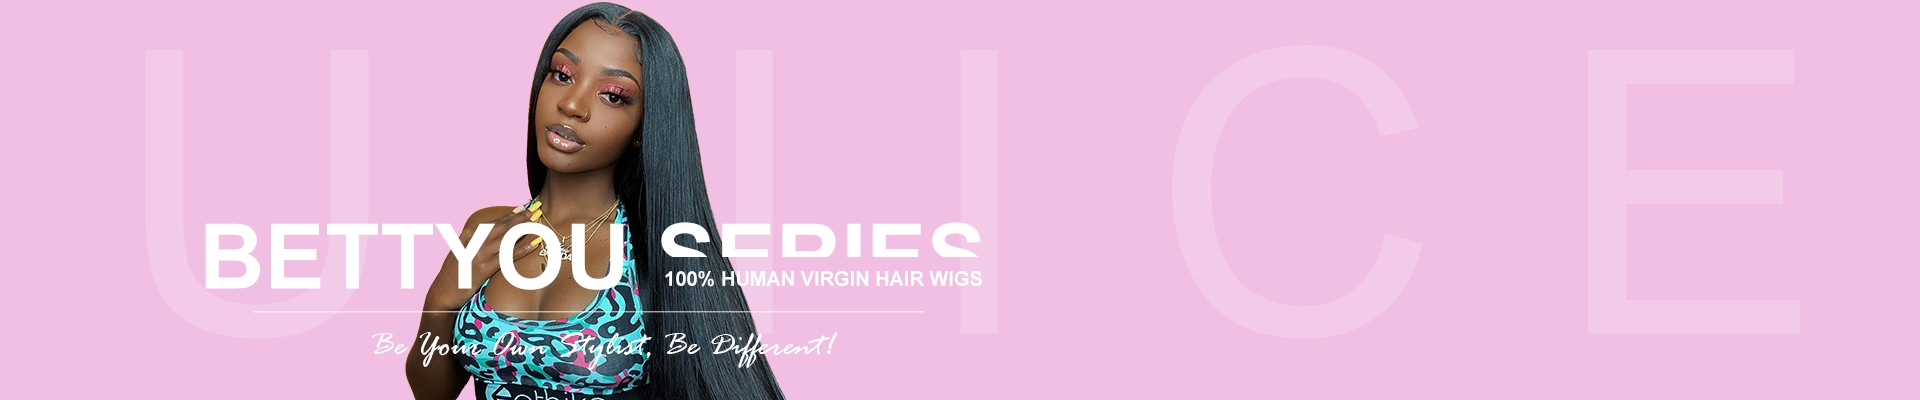 UNice Bettyou Series: 100% Human Hair Wigs